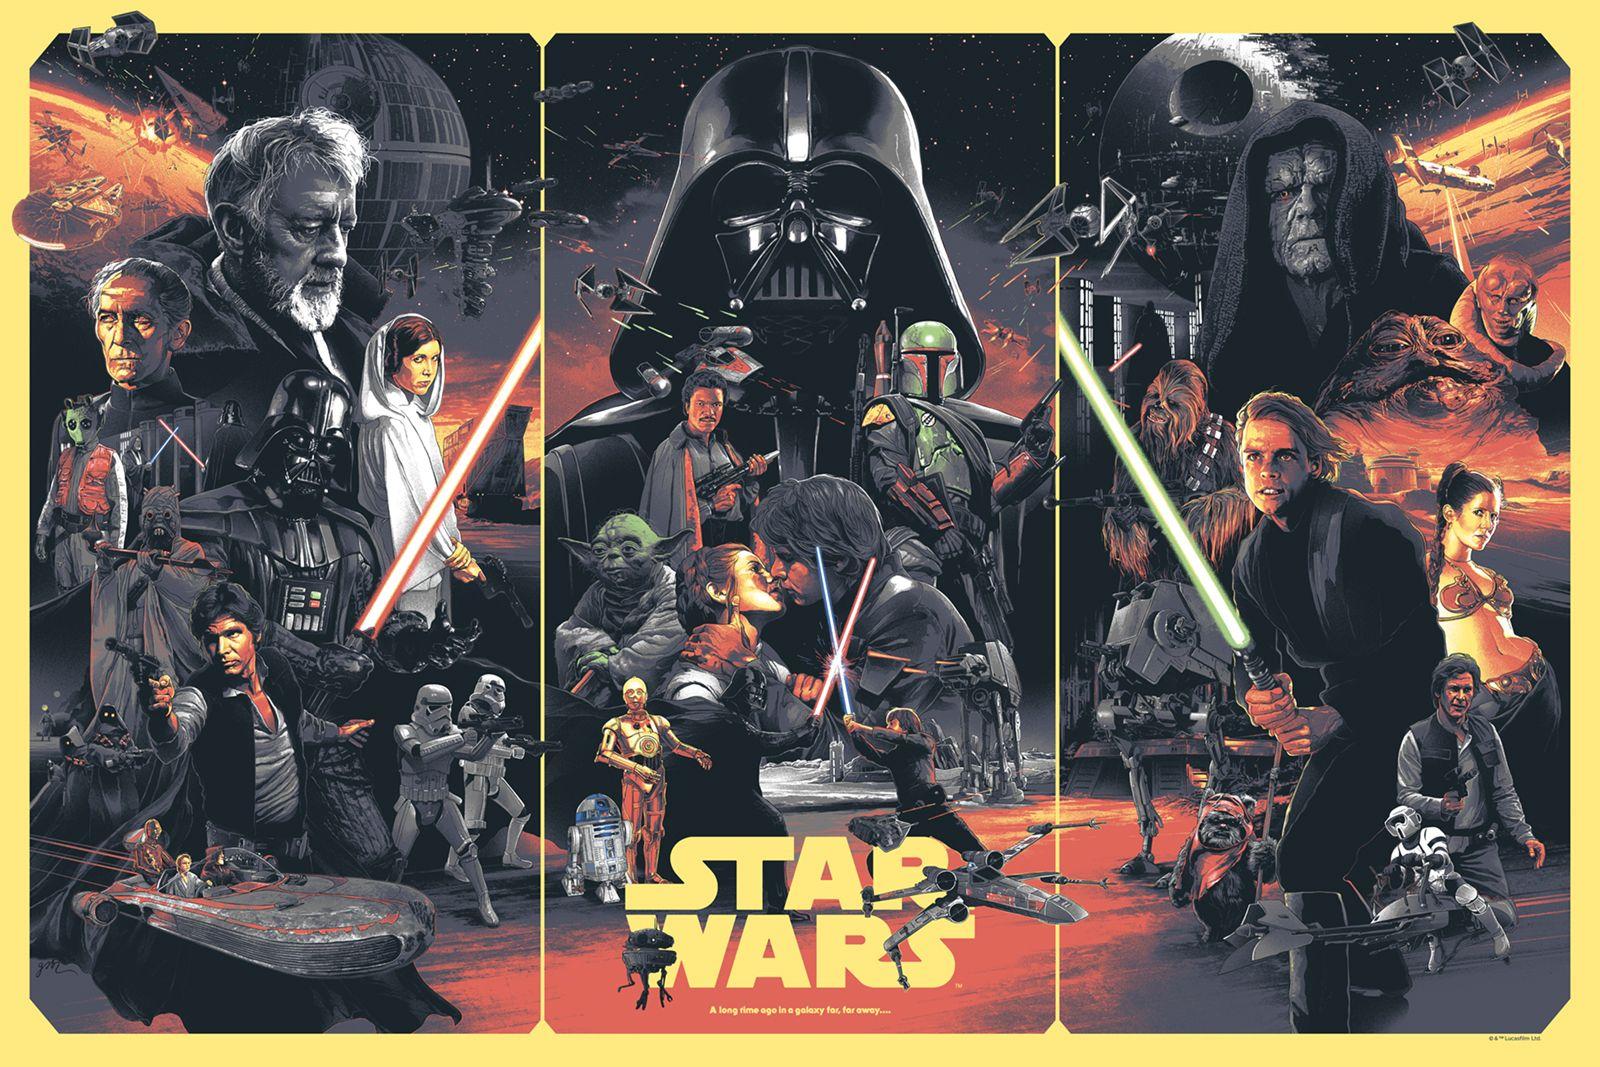 Star Wars Poster By Gabz For Bottleneck Gallery